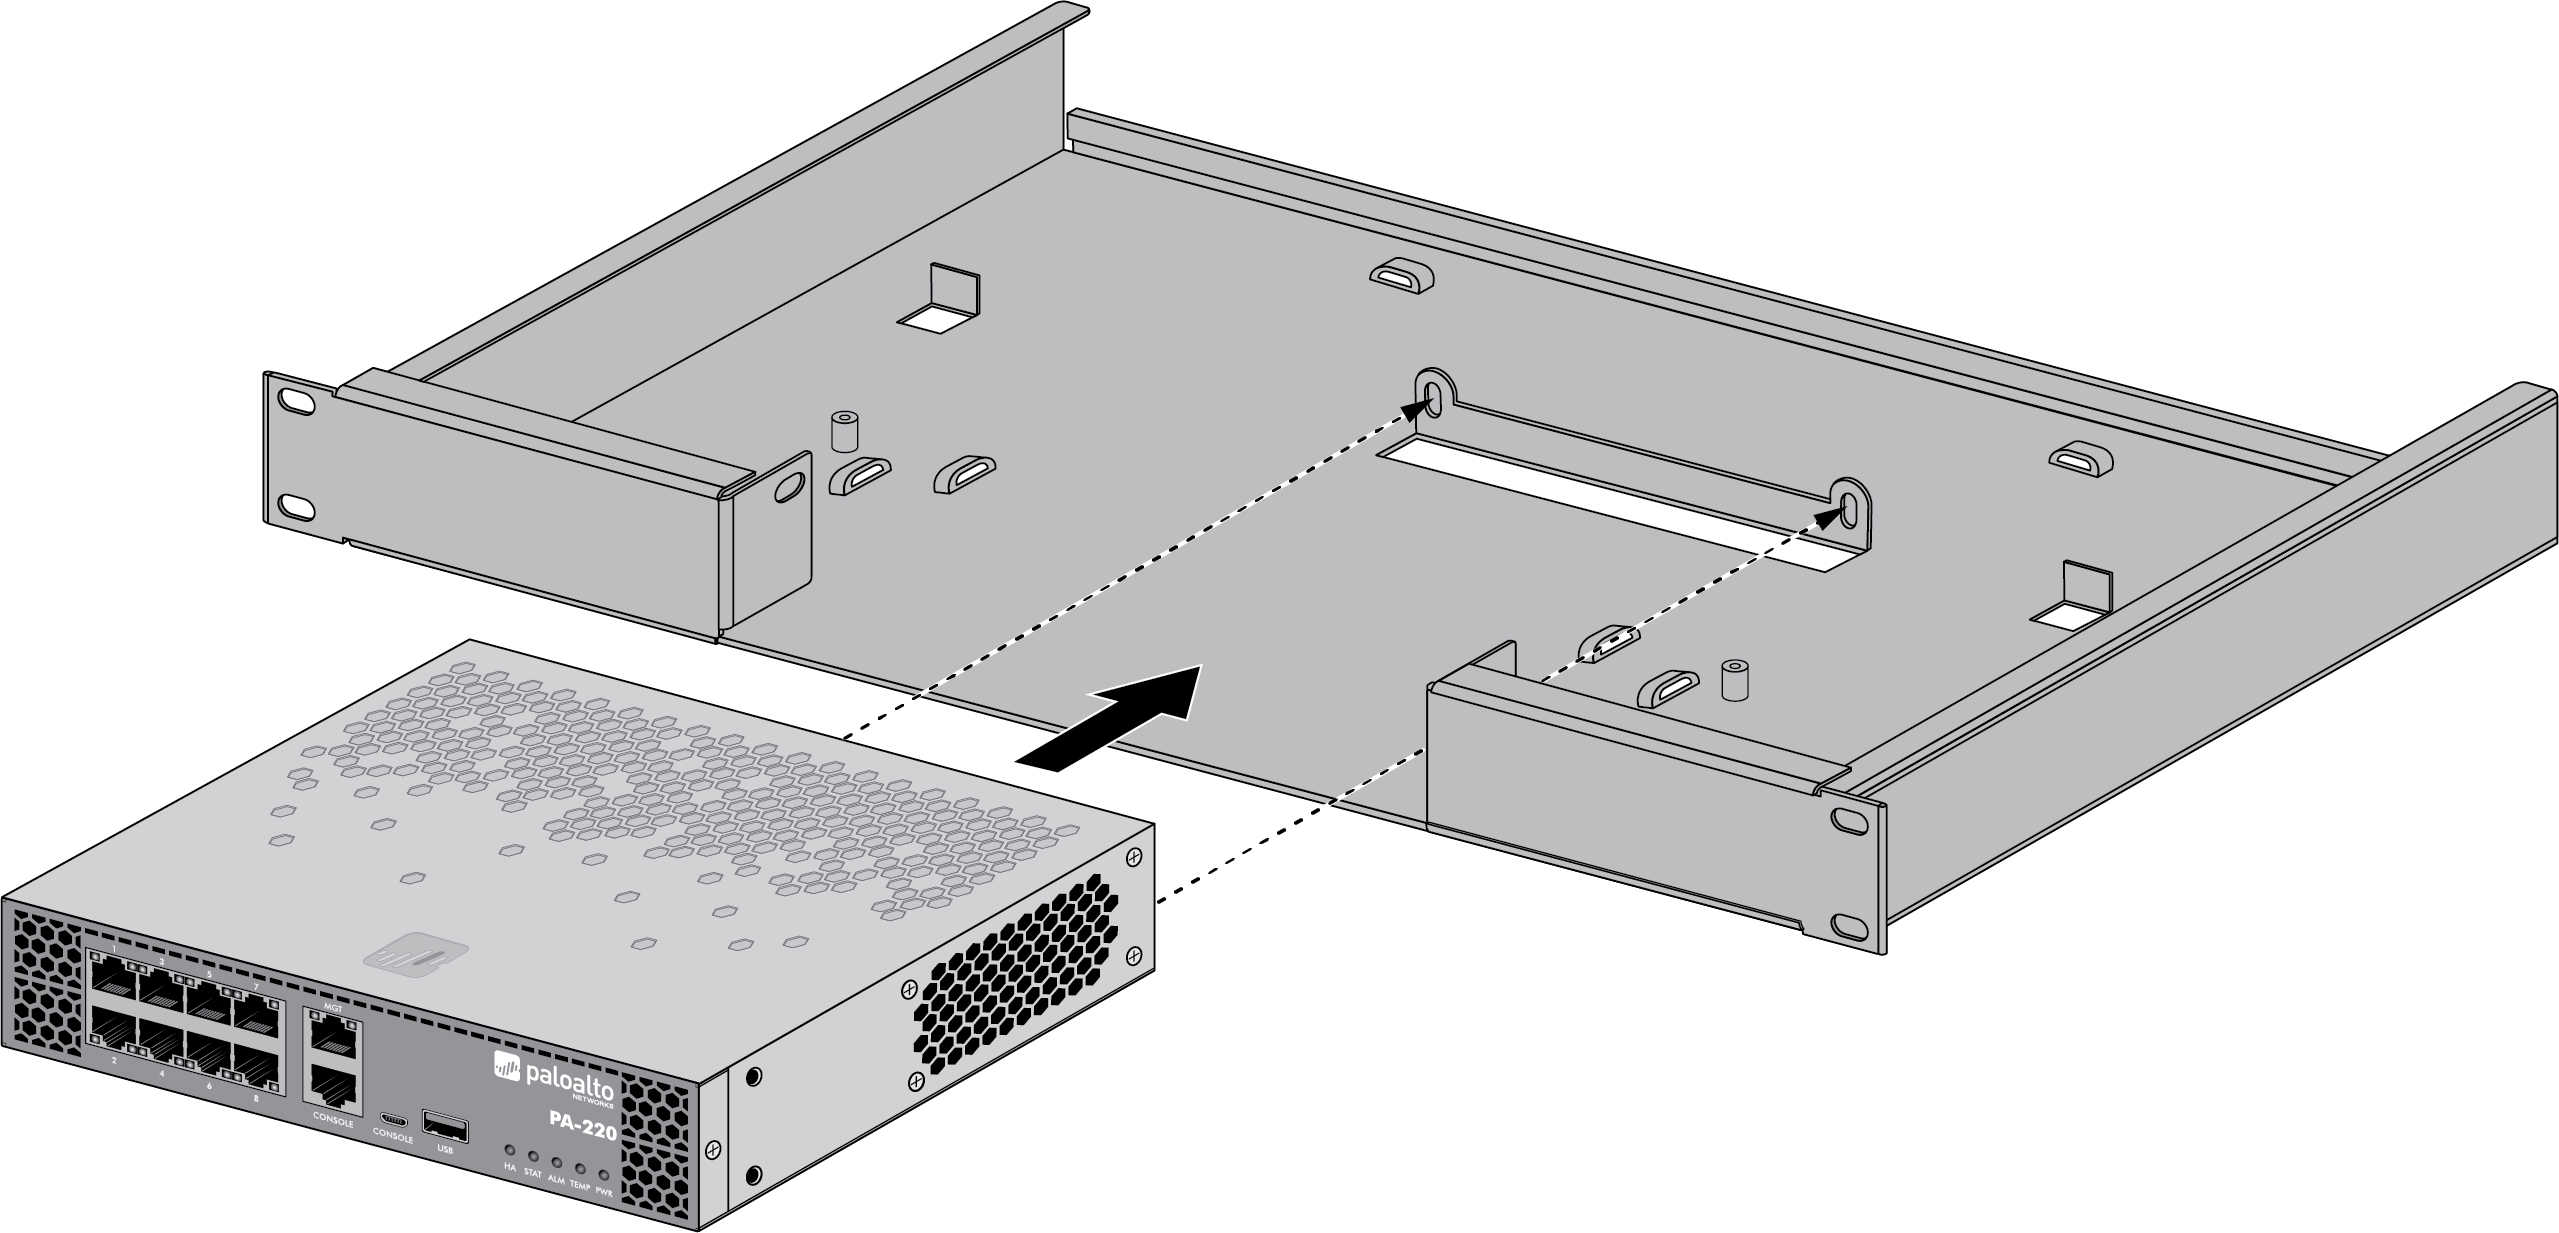 pa-220-rack-single-1